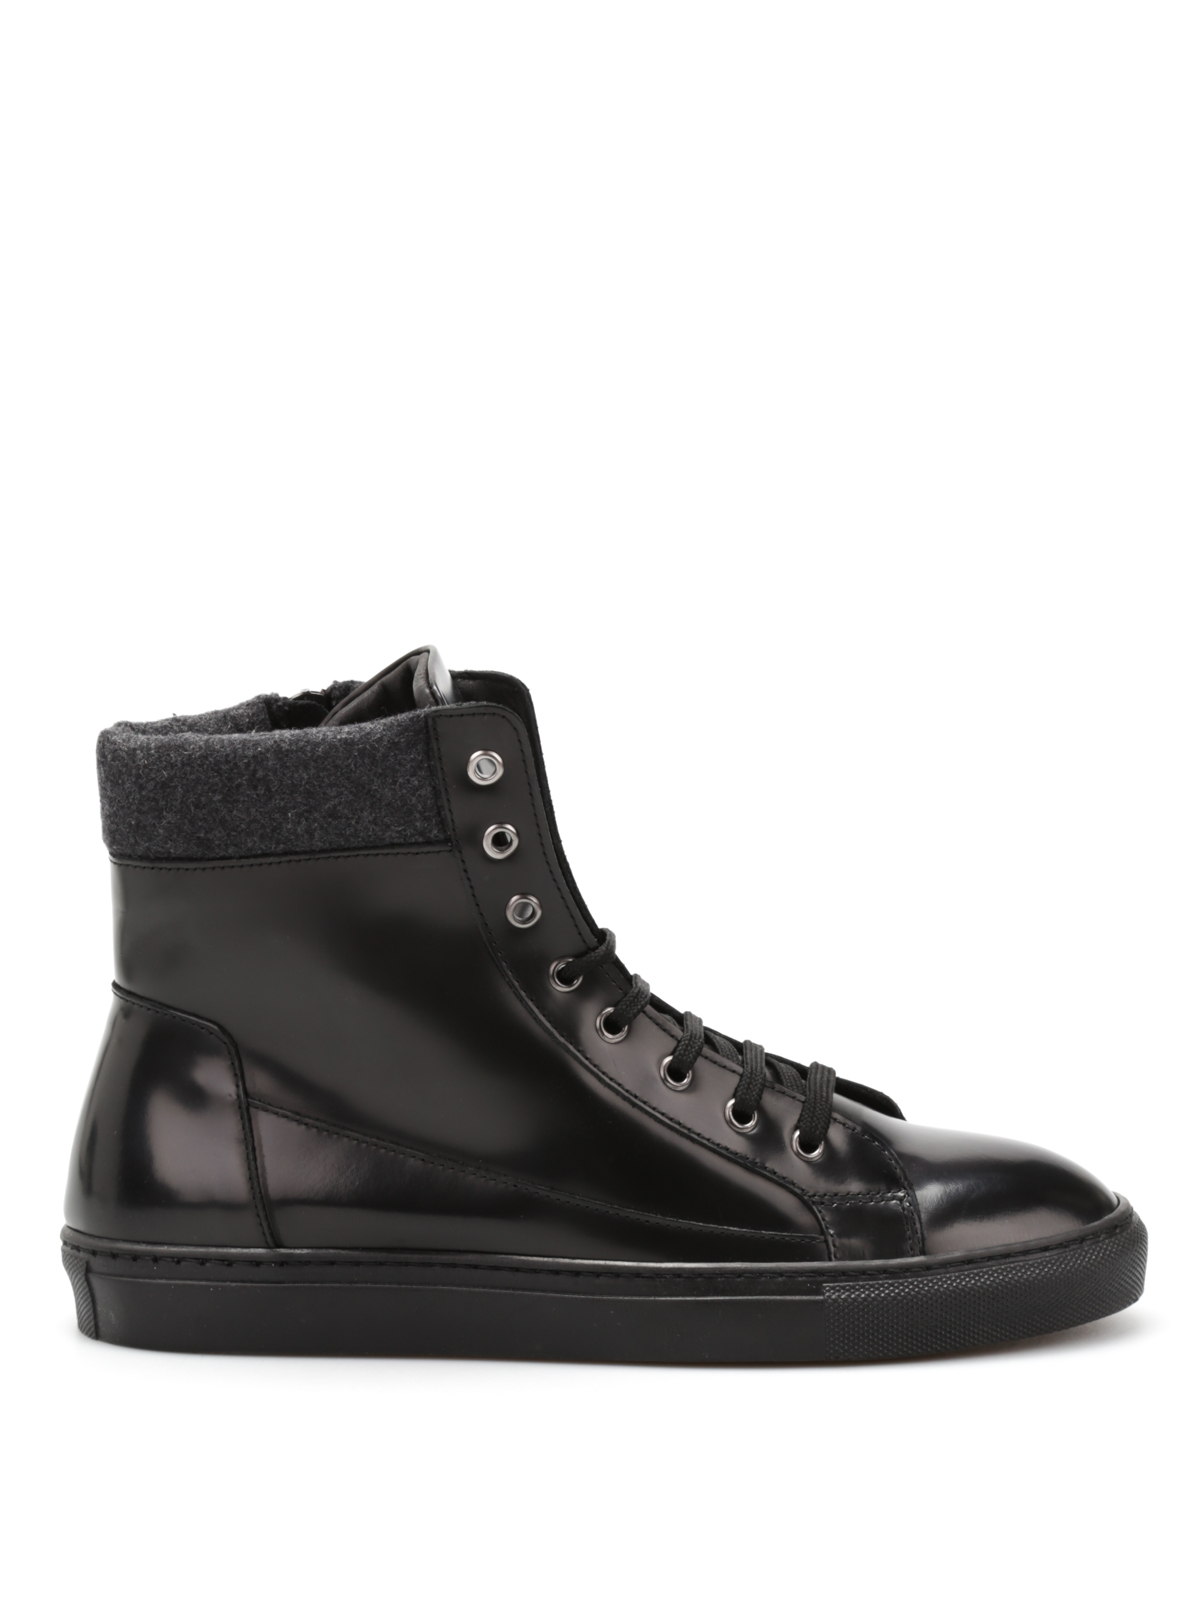 Armani Collezioni Hightops Et Chaussures De Sport R9Q5TRLGPf ... 9bf1efd8dc91